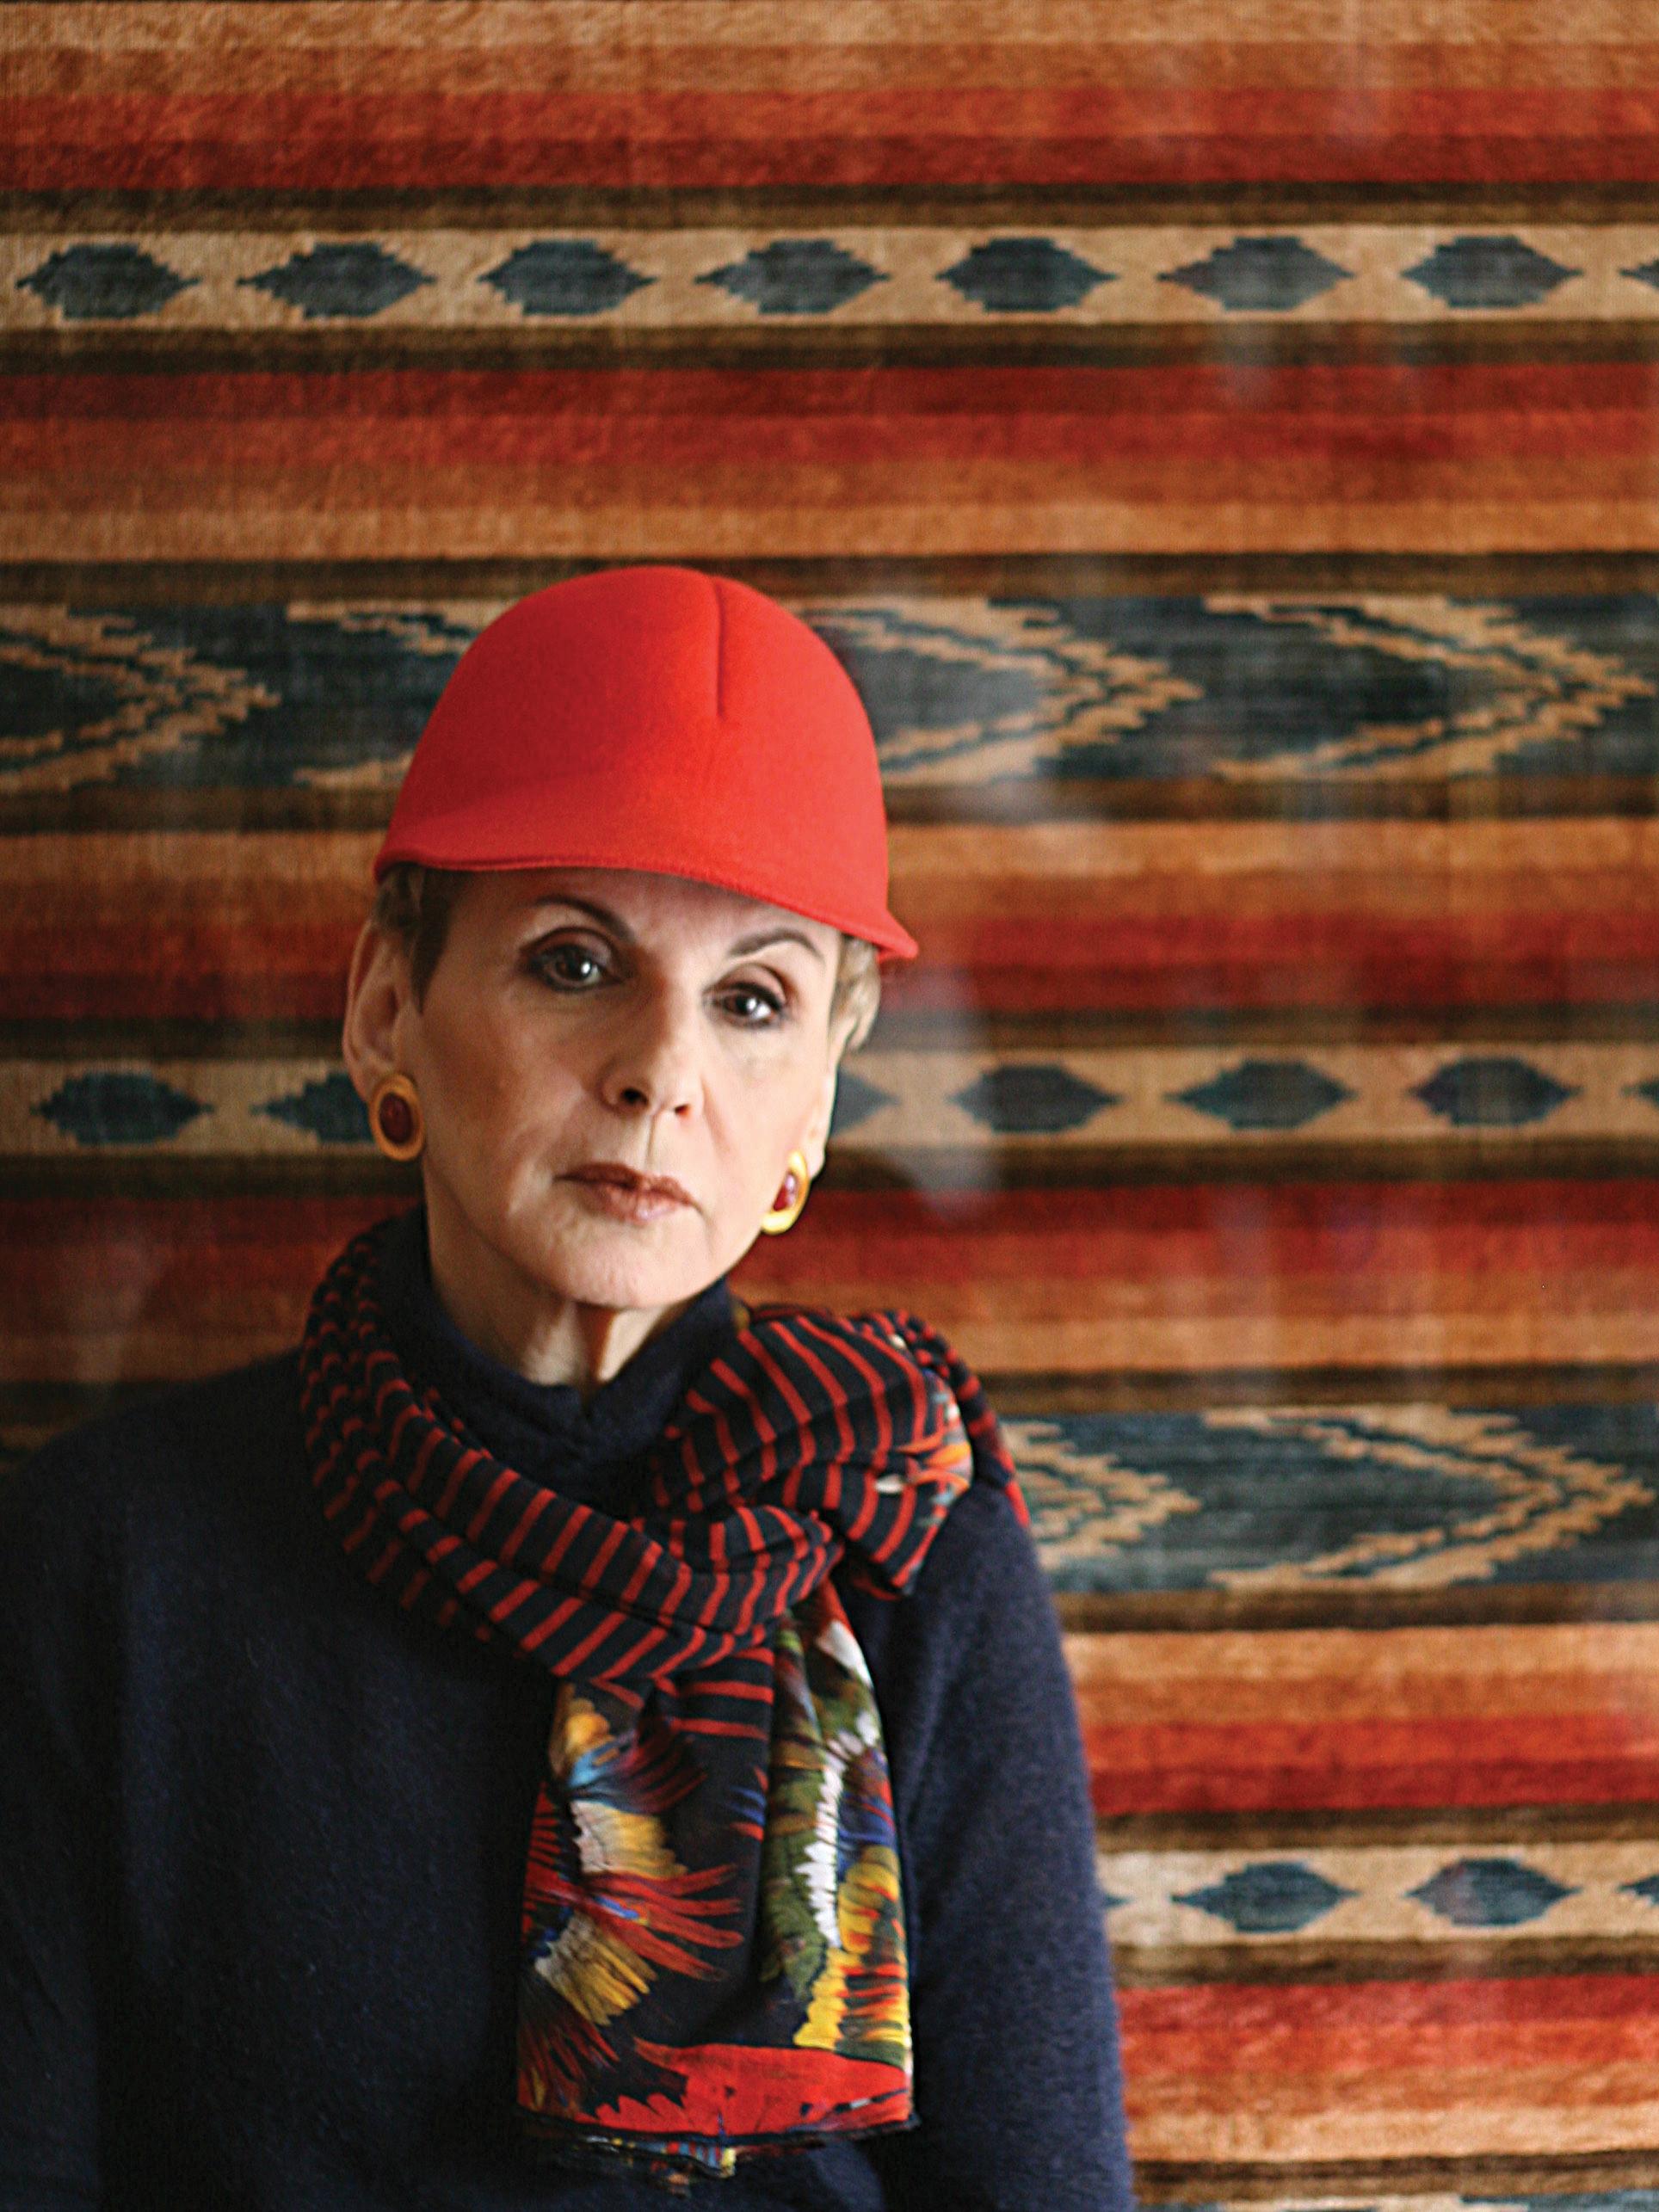 Image of Lynn Gilbert from Wikidata